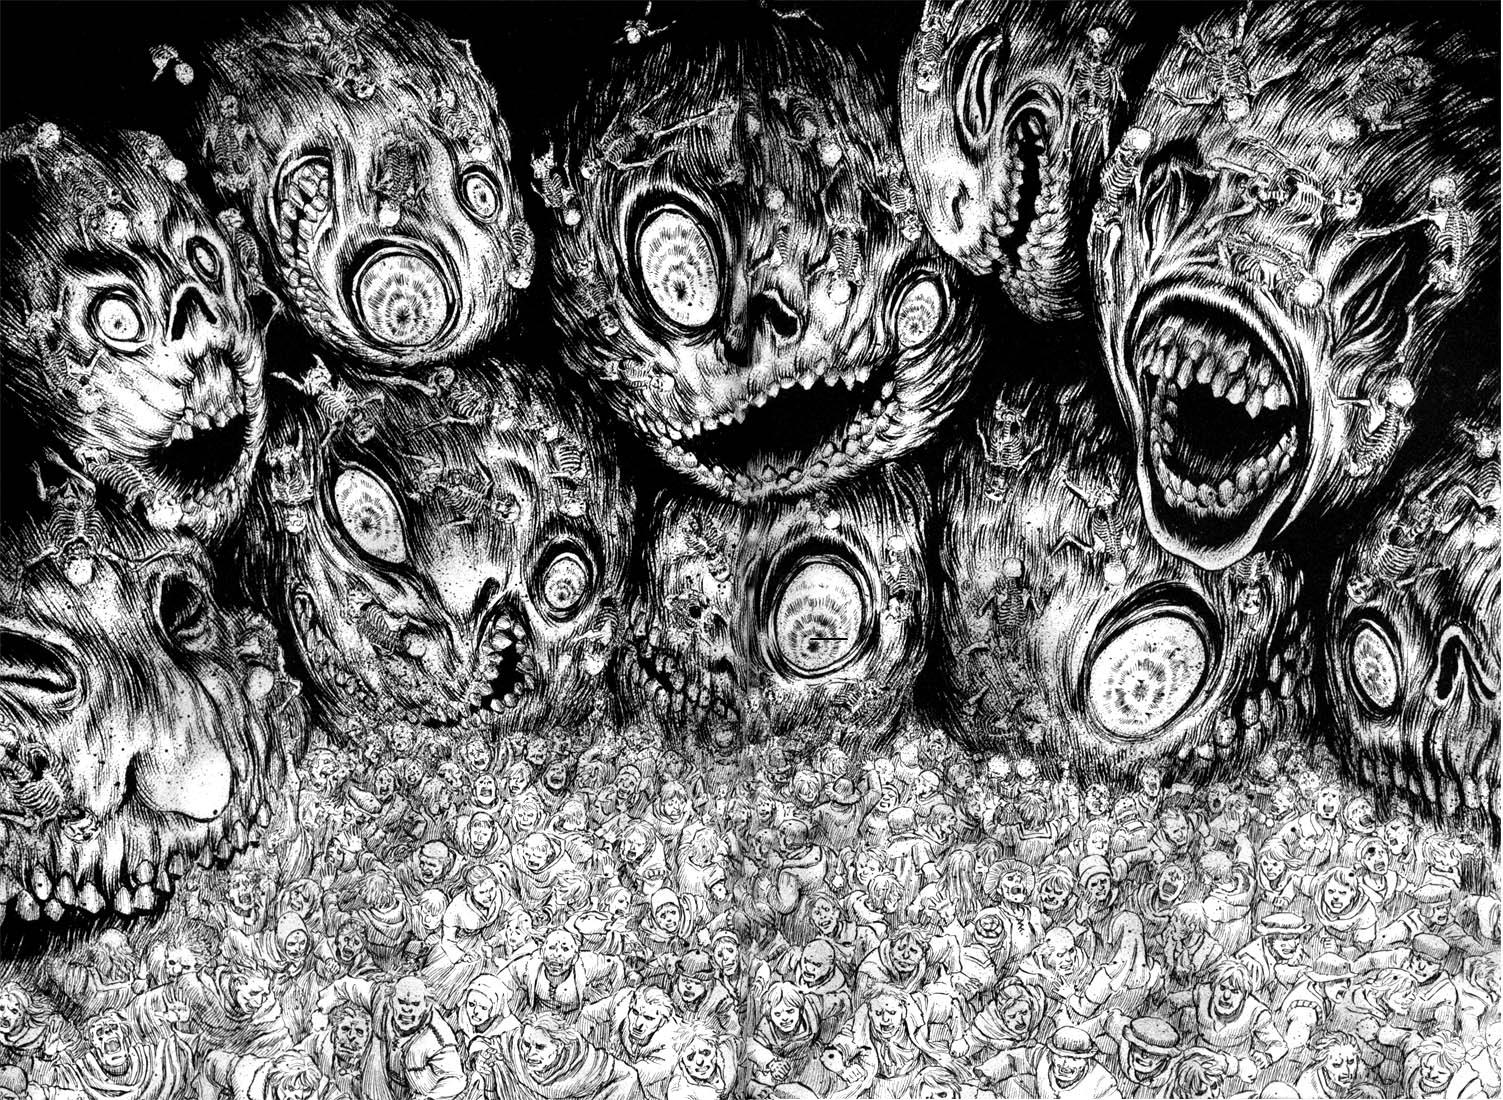 Drawn optical illusion wallpaper Full 1626 Optical Kb 1080p